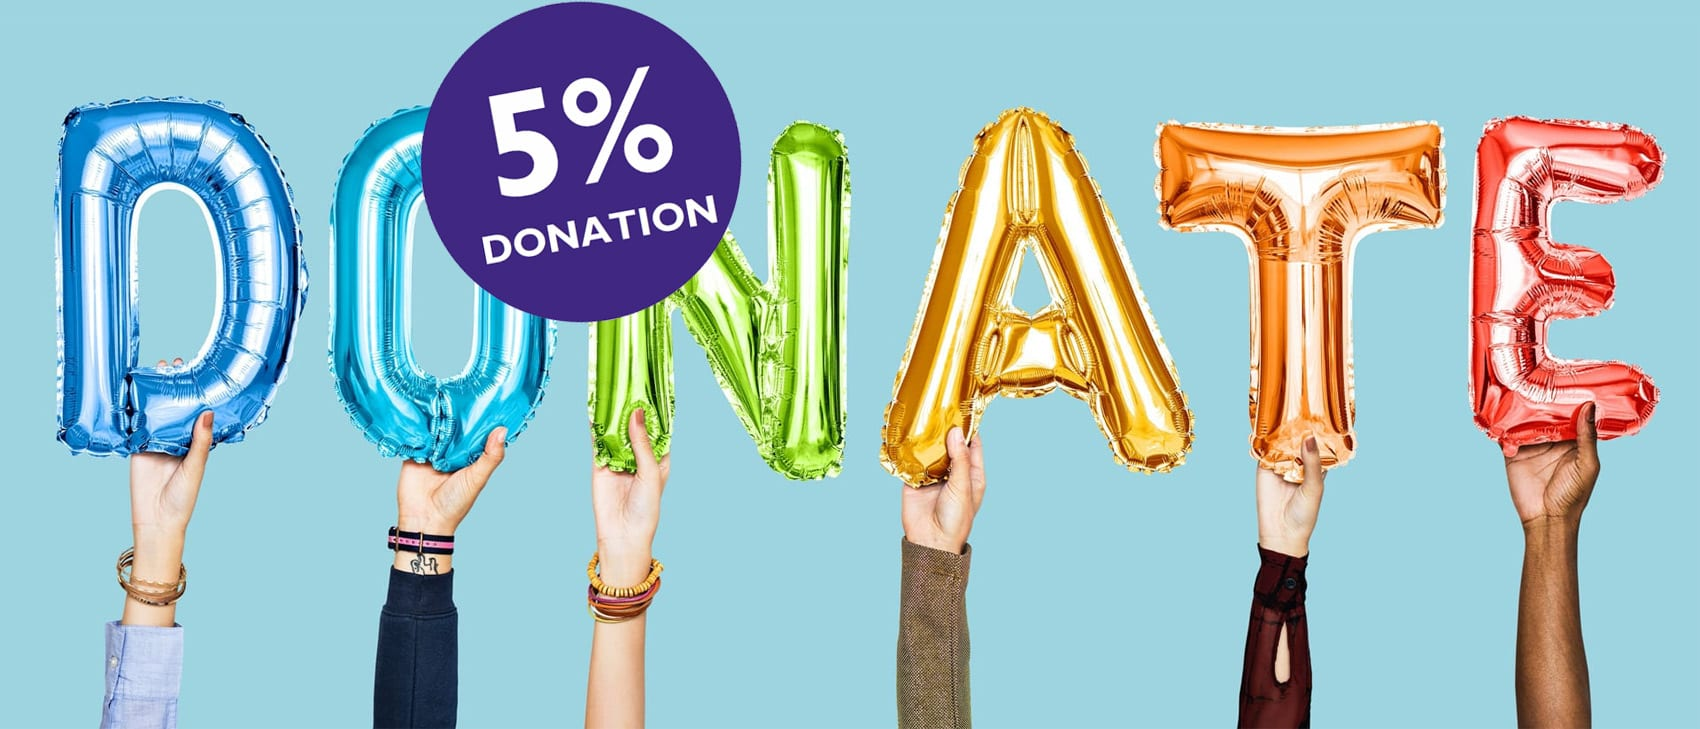 charity website design donation